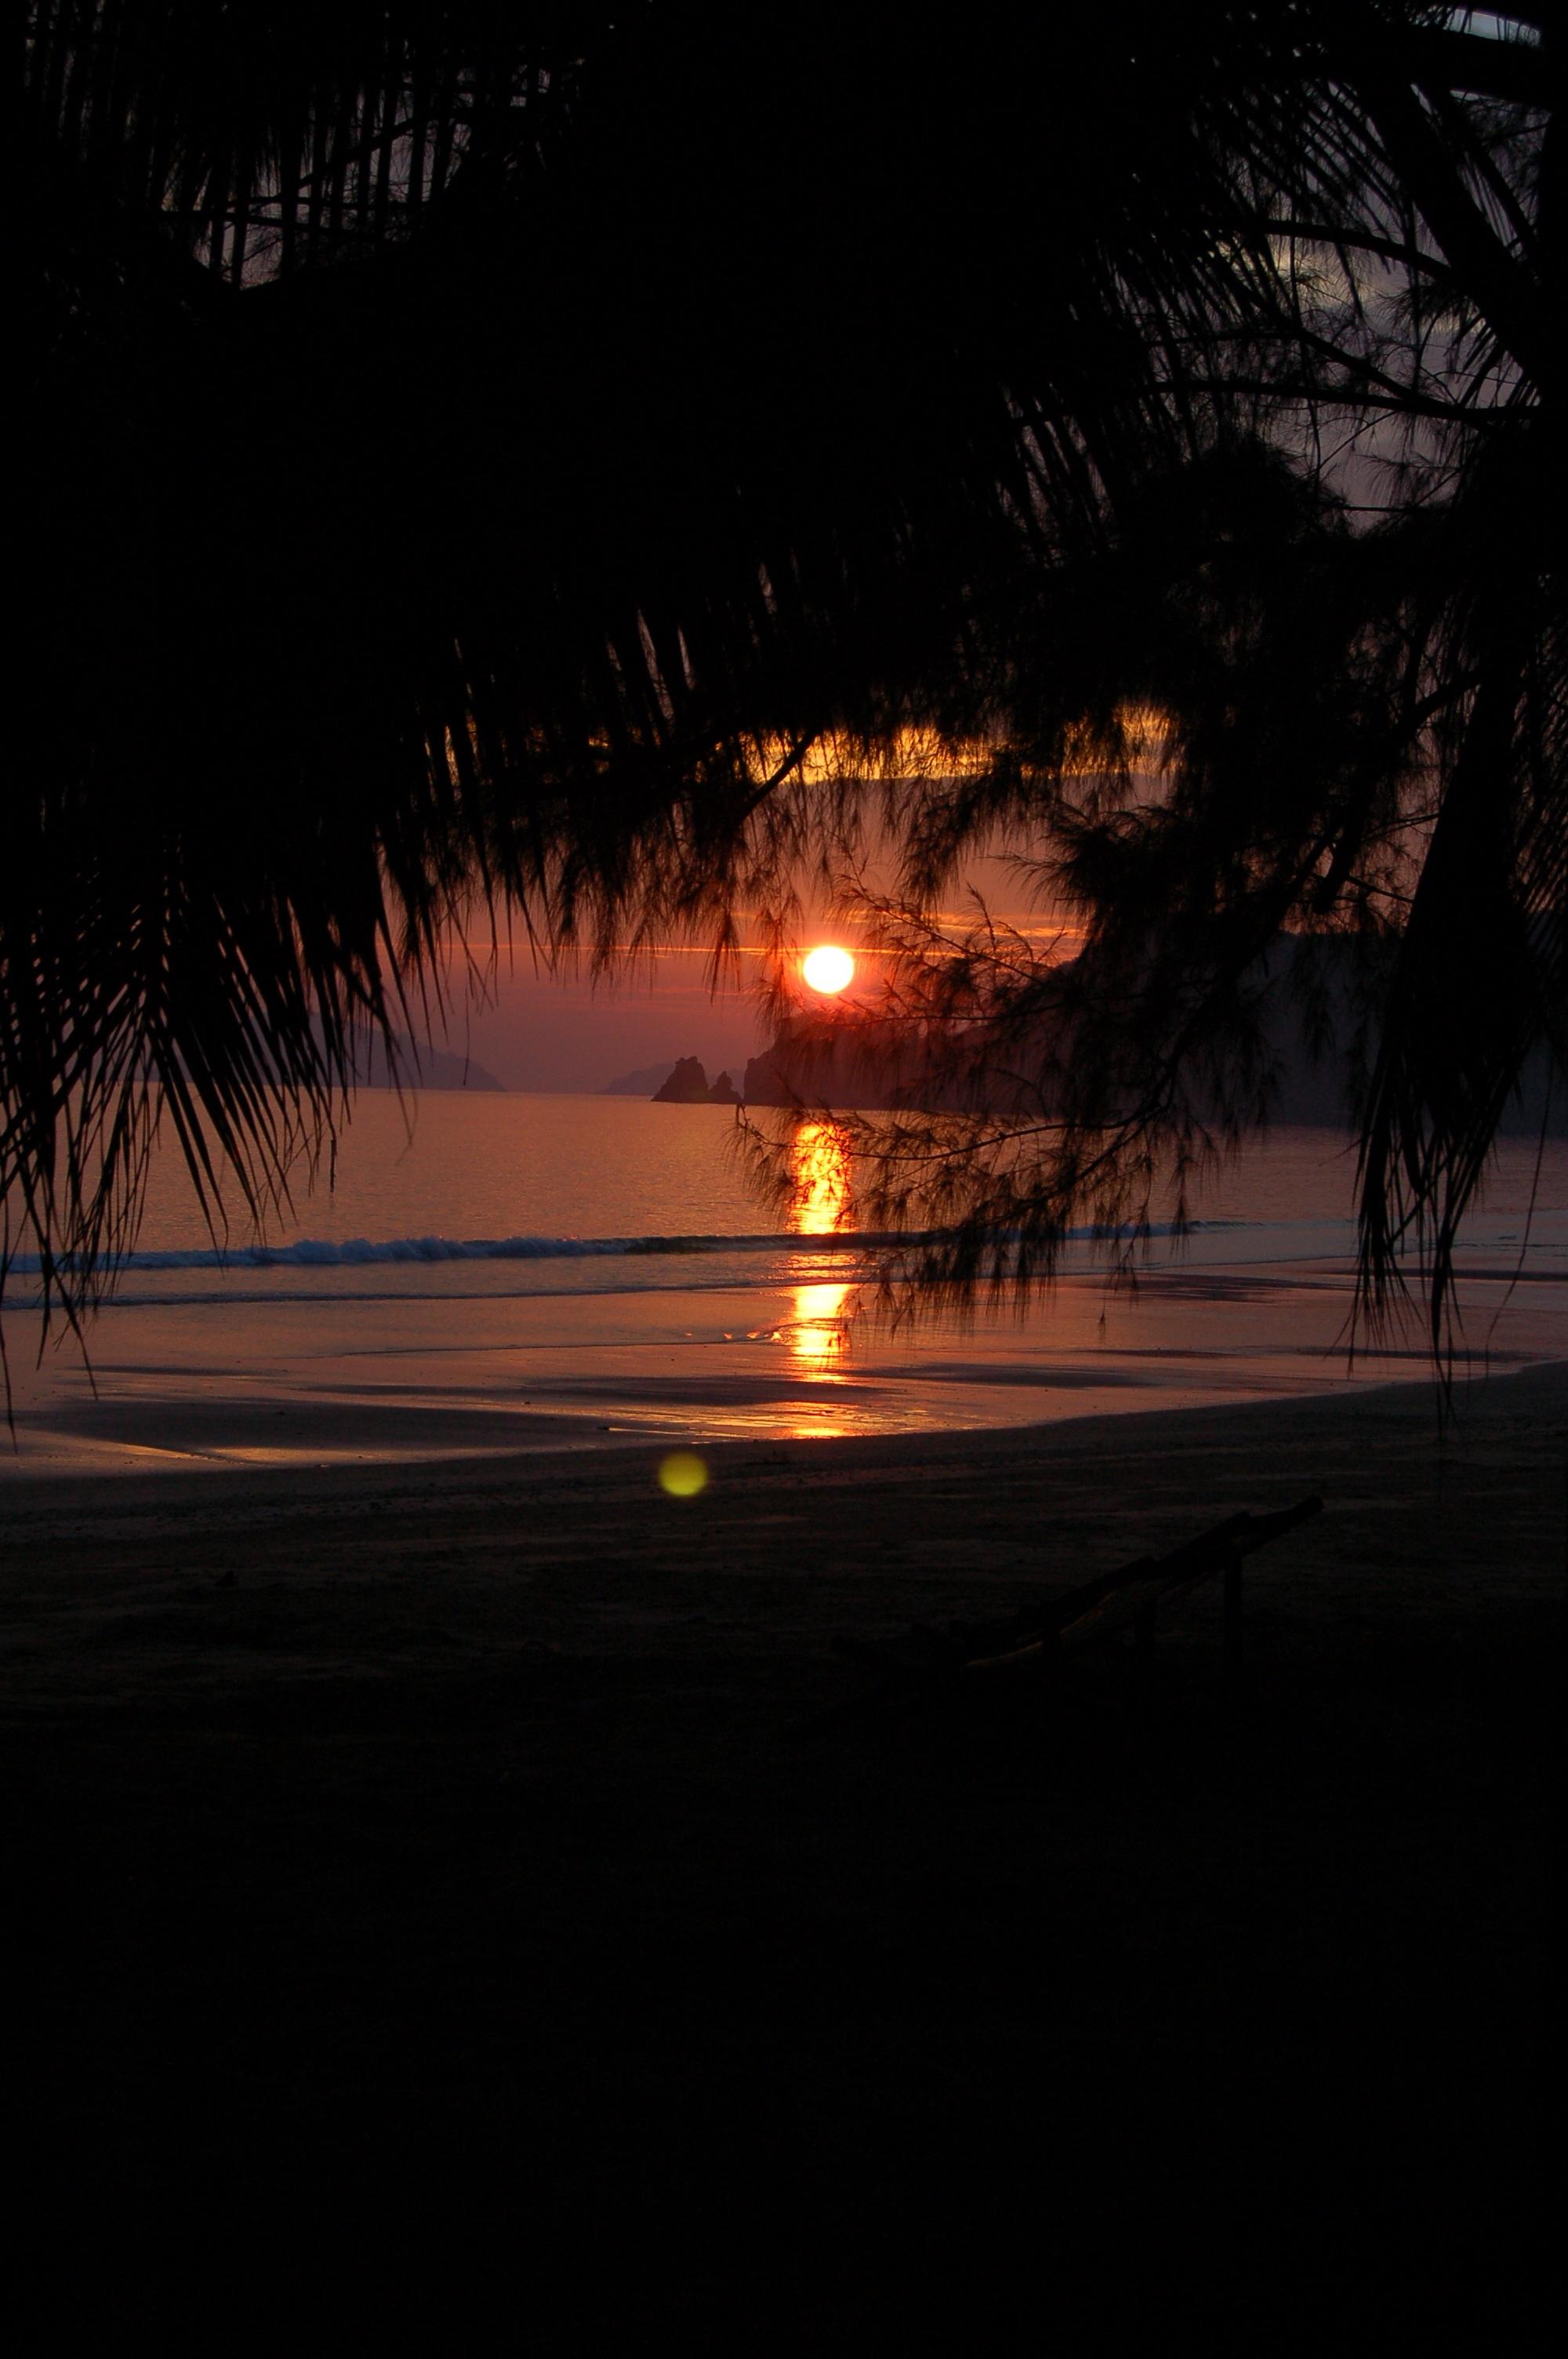 Vacation holidays dusk